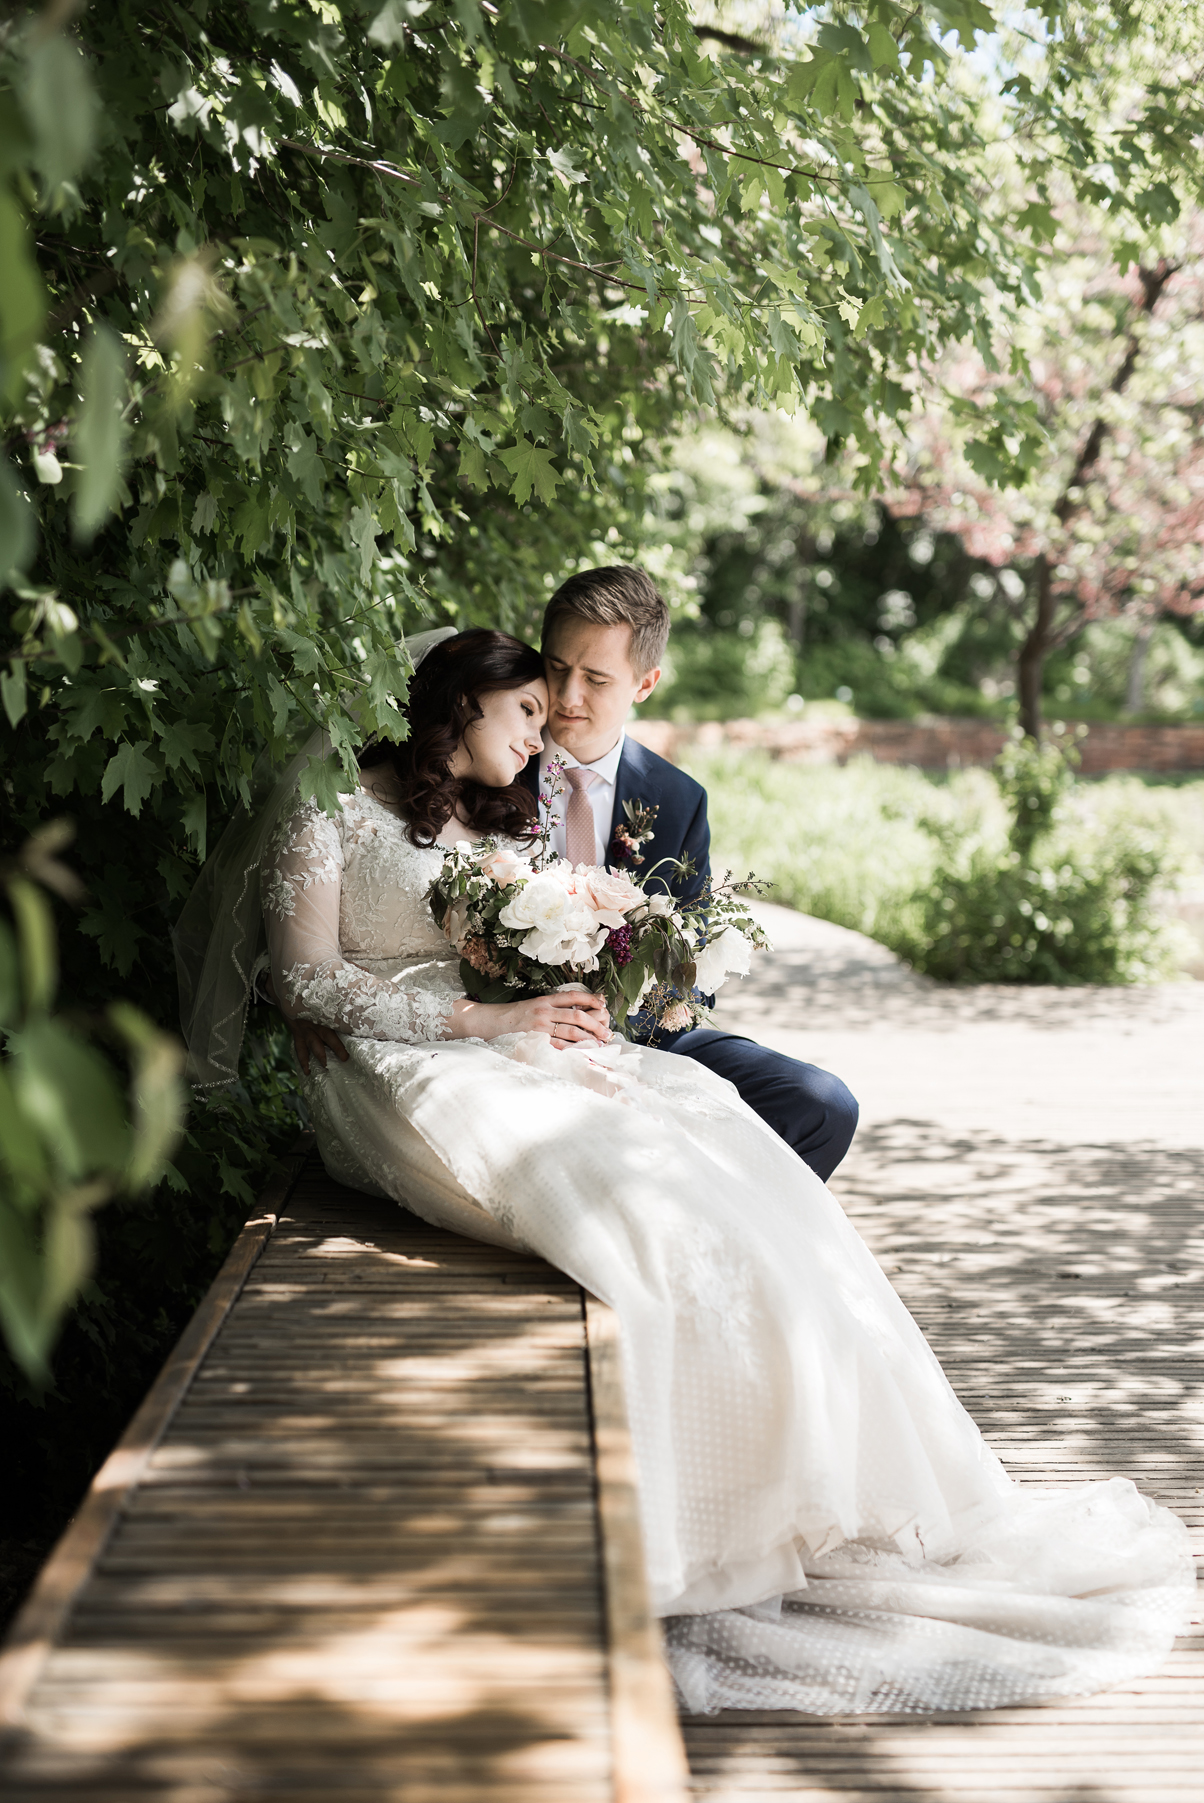 loving wedding photography at red butte gardens | Elisha Braithwaite Photography